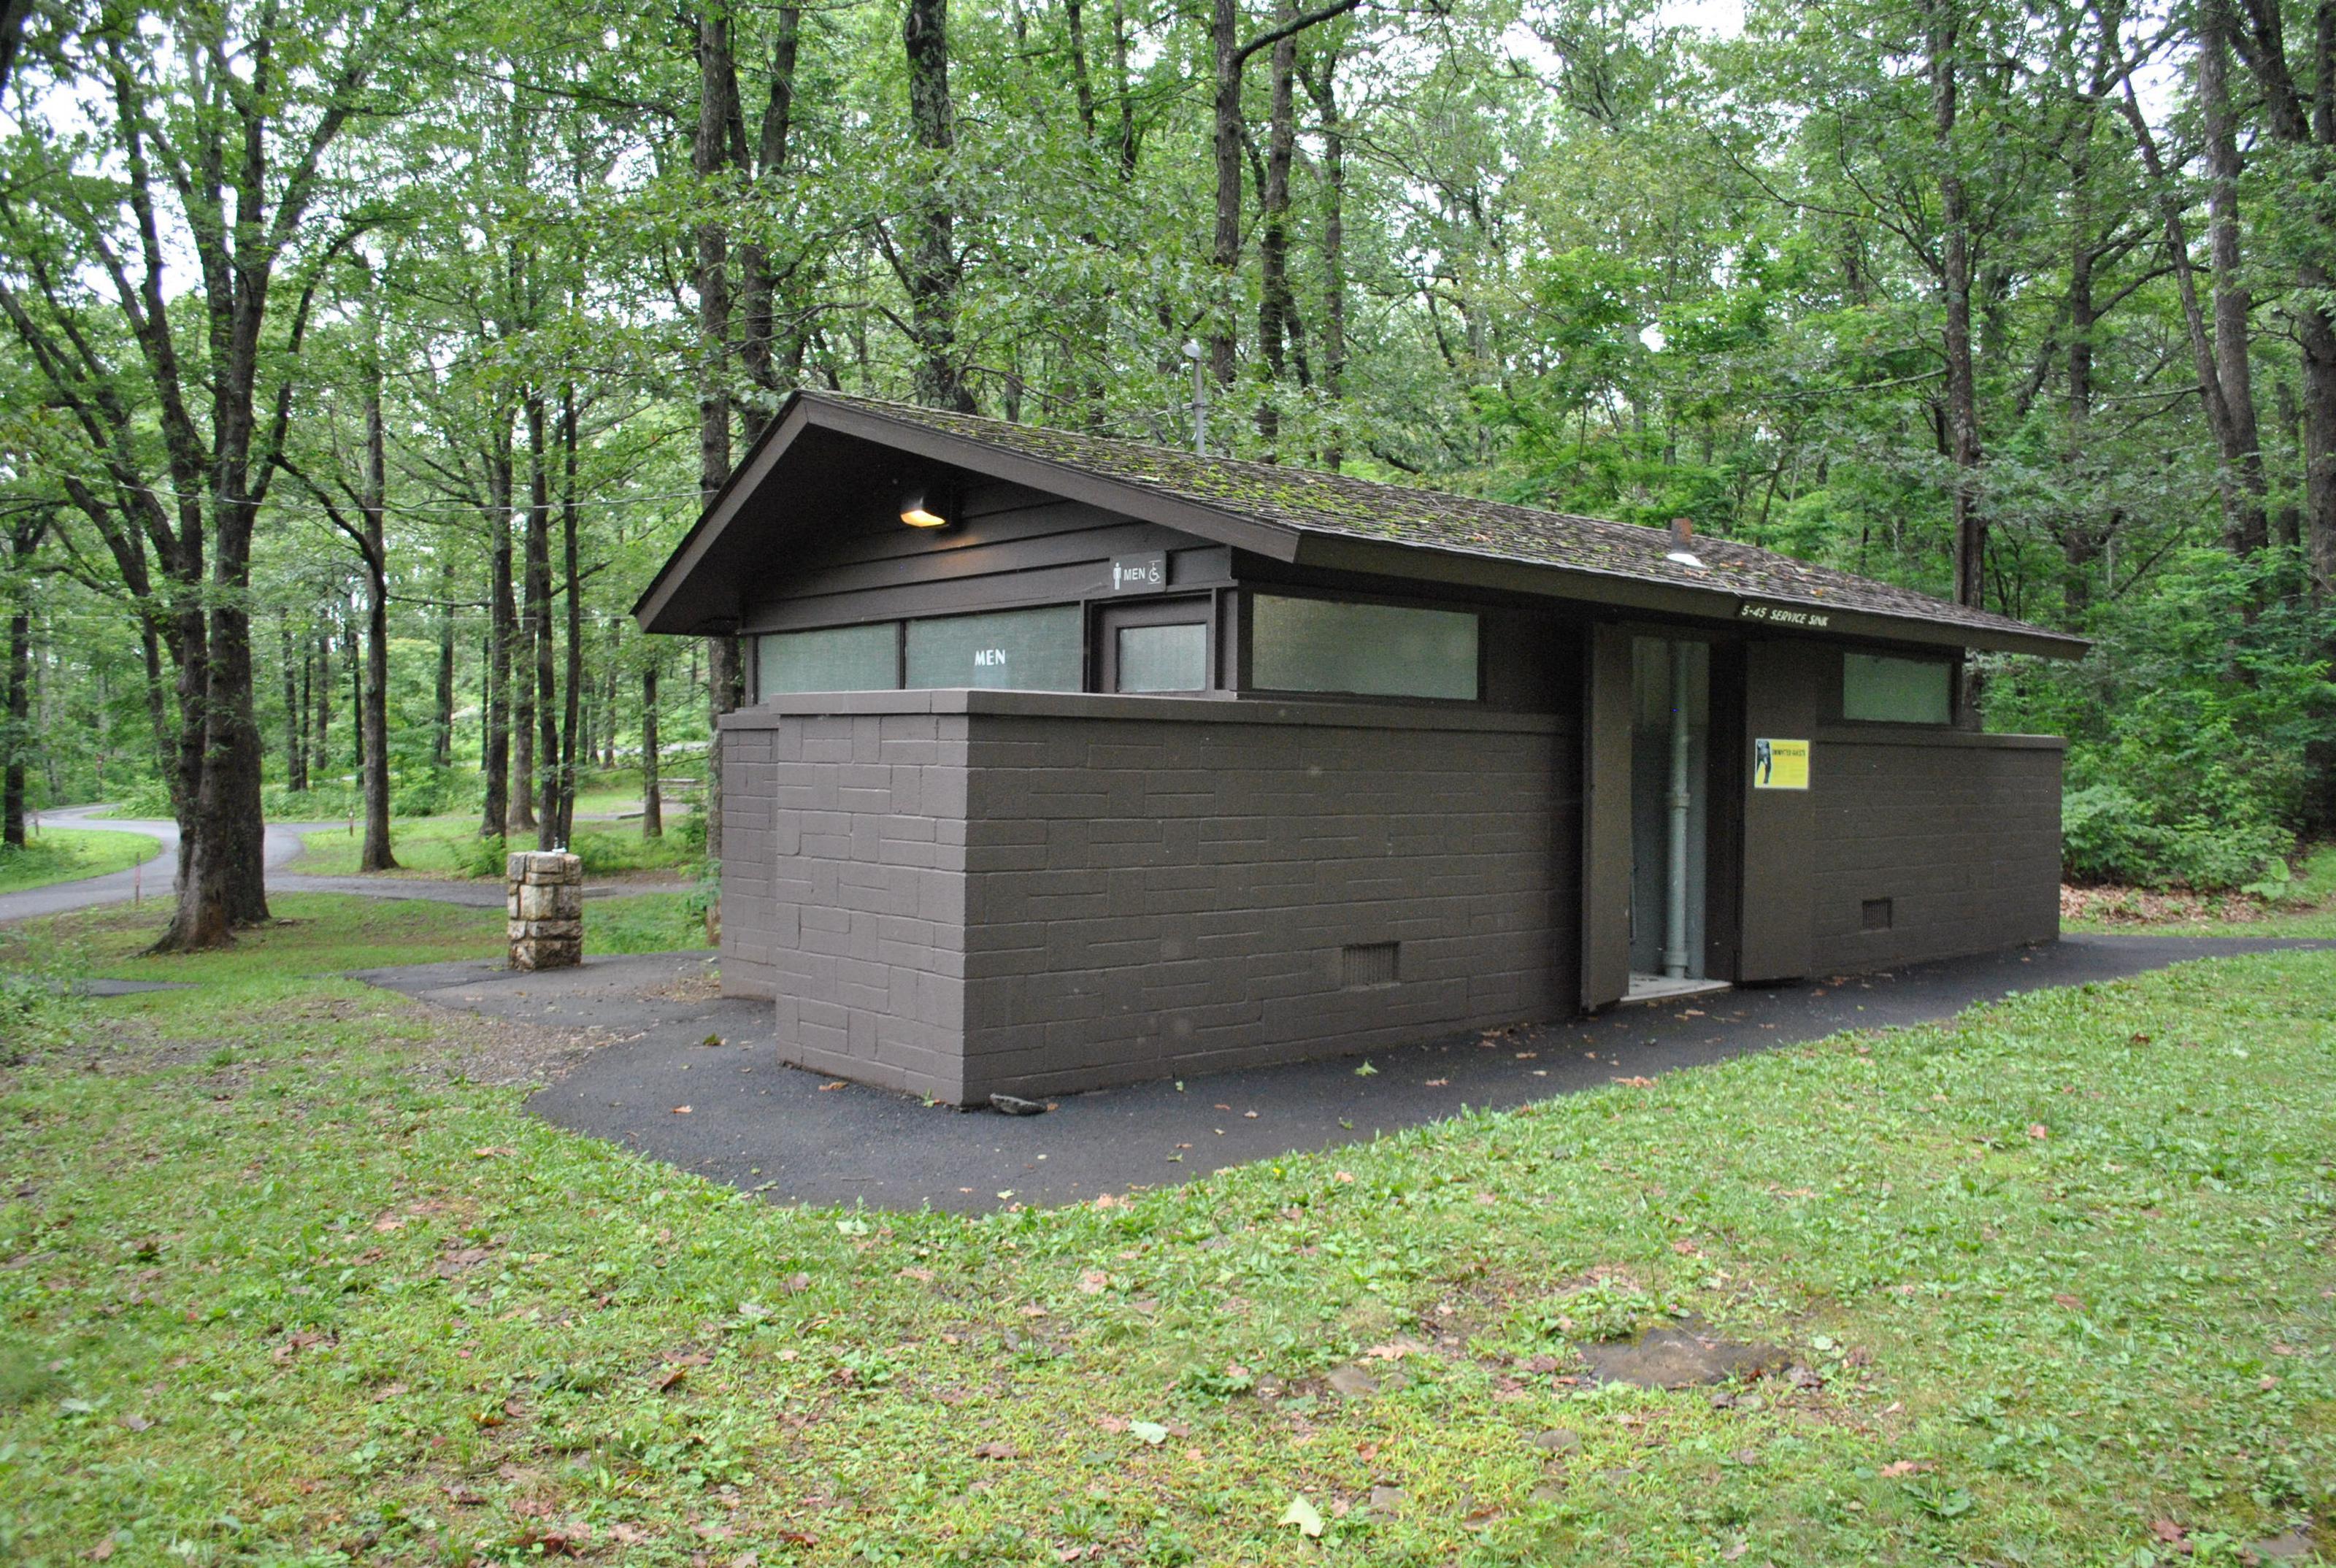 Mathews Arm Campground Bathroom and Utility Sink Facility